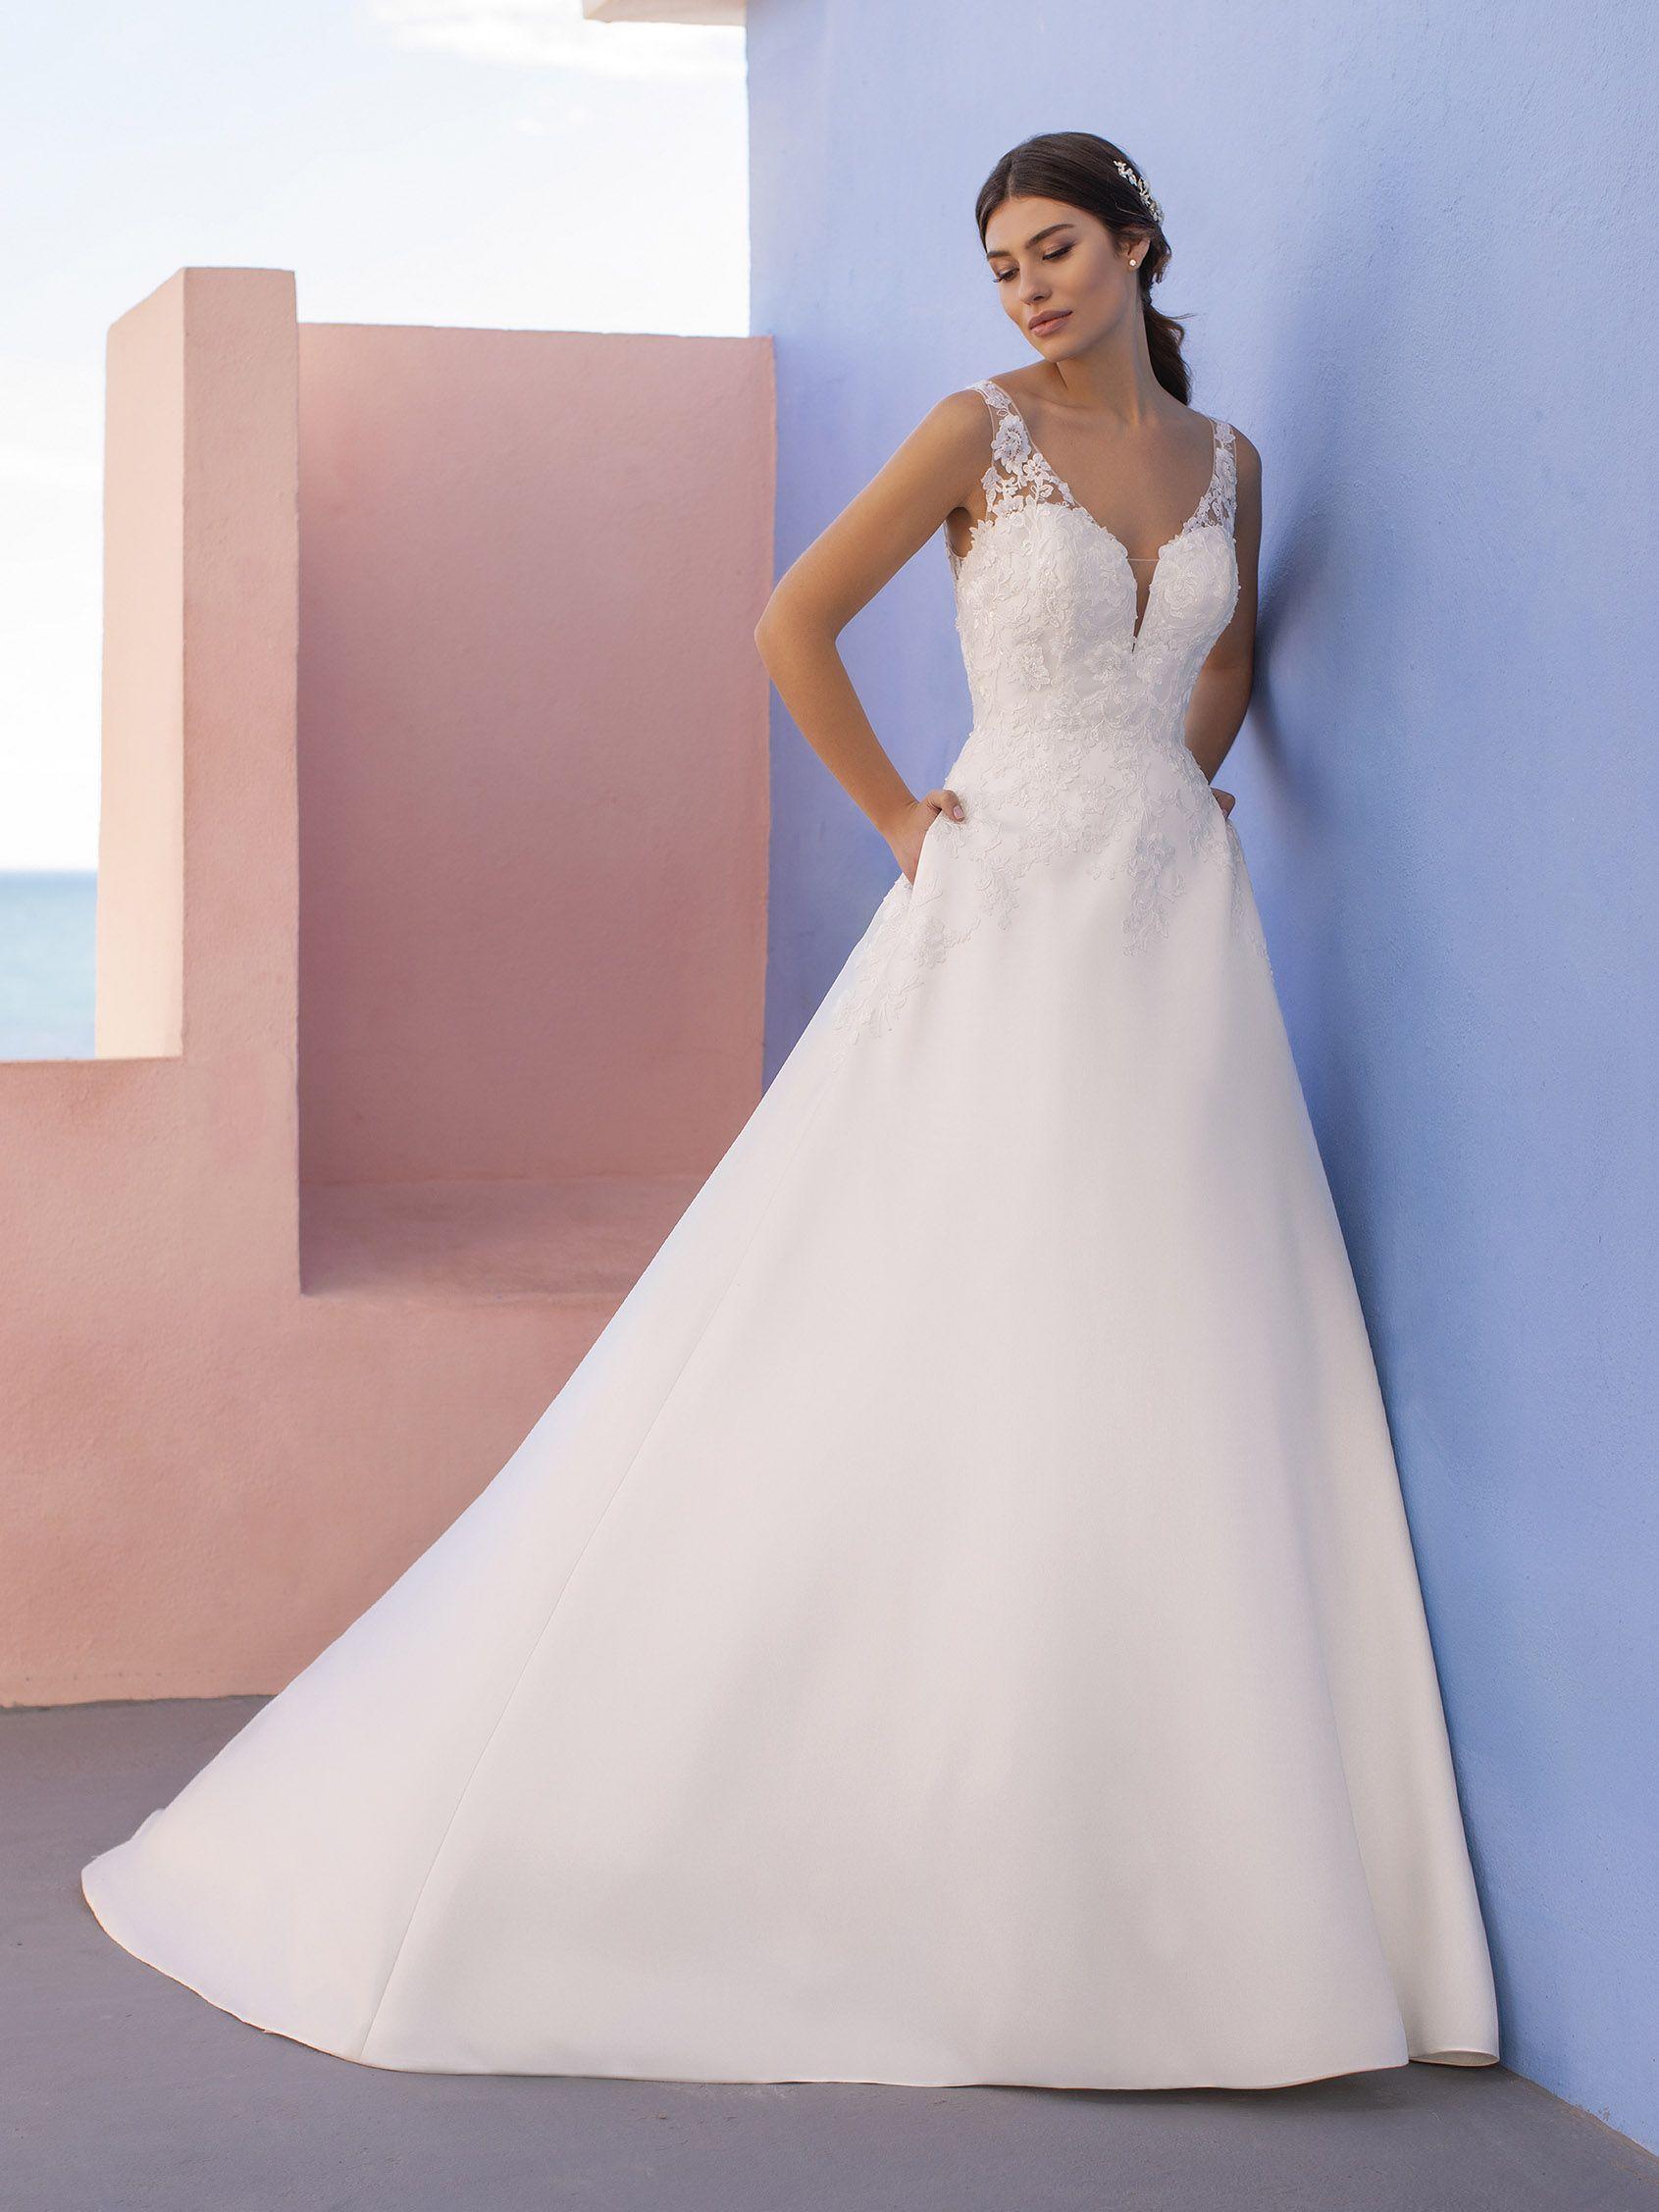 W1-gleam-b-Lesmariesdalice-whiteone-stra